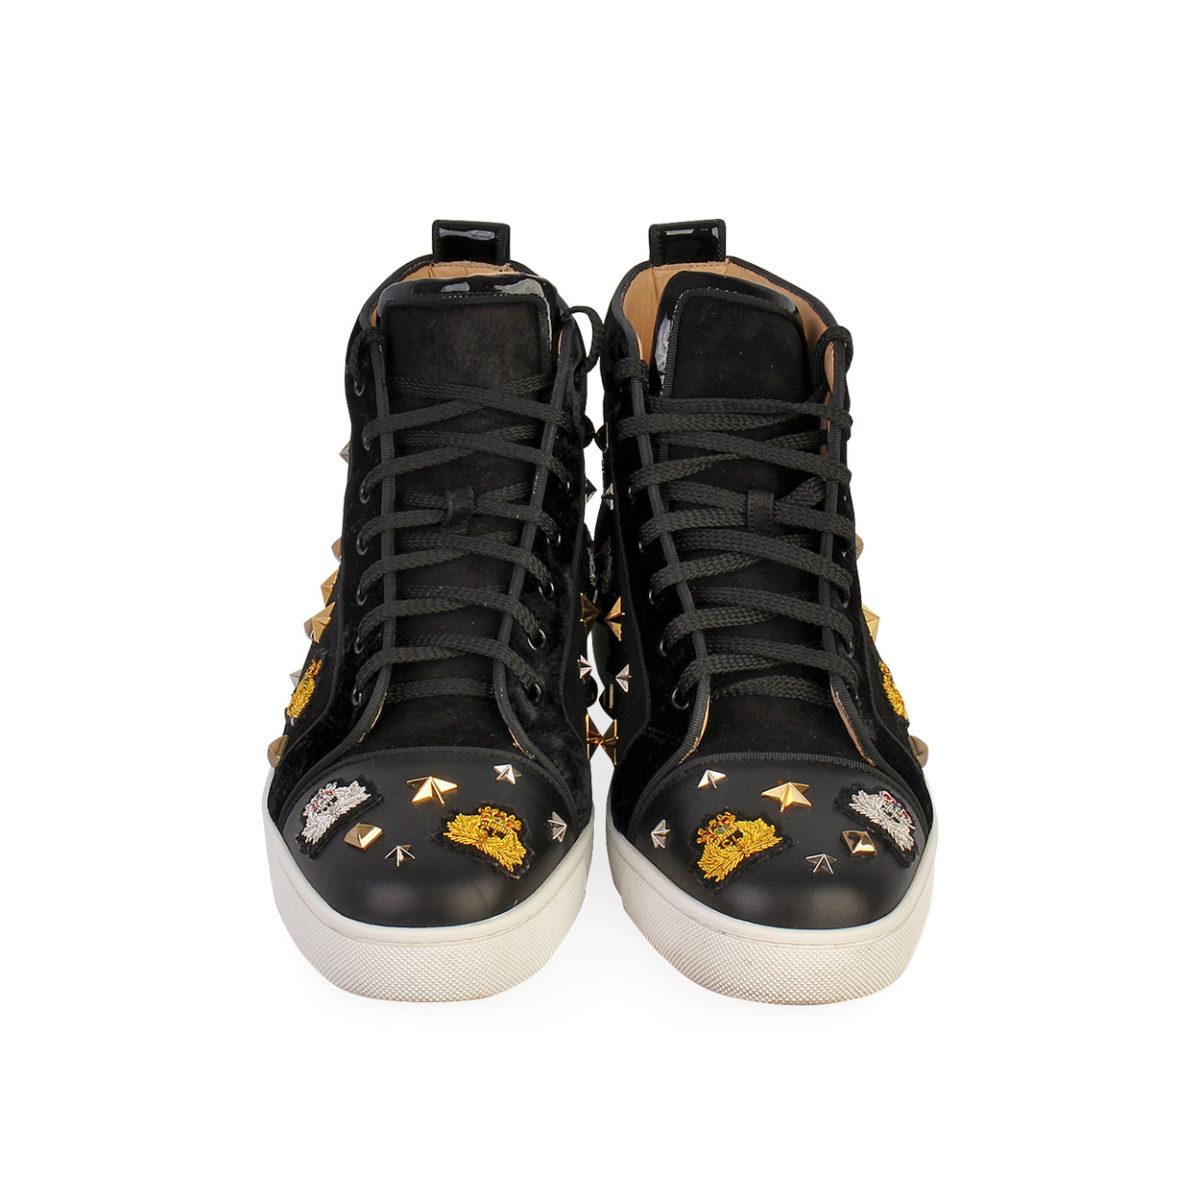 san francisco 48894 36459 CHRISTIAN LOUBOUTIN Velvet/Leather Studded Crest High Top Sneakers Black -  S: 43.5 (9)